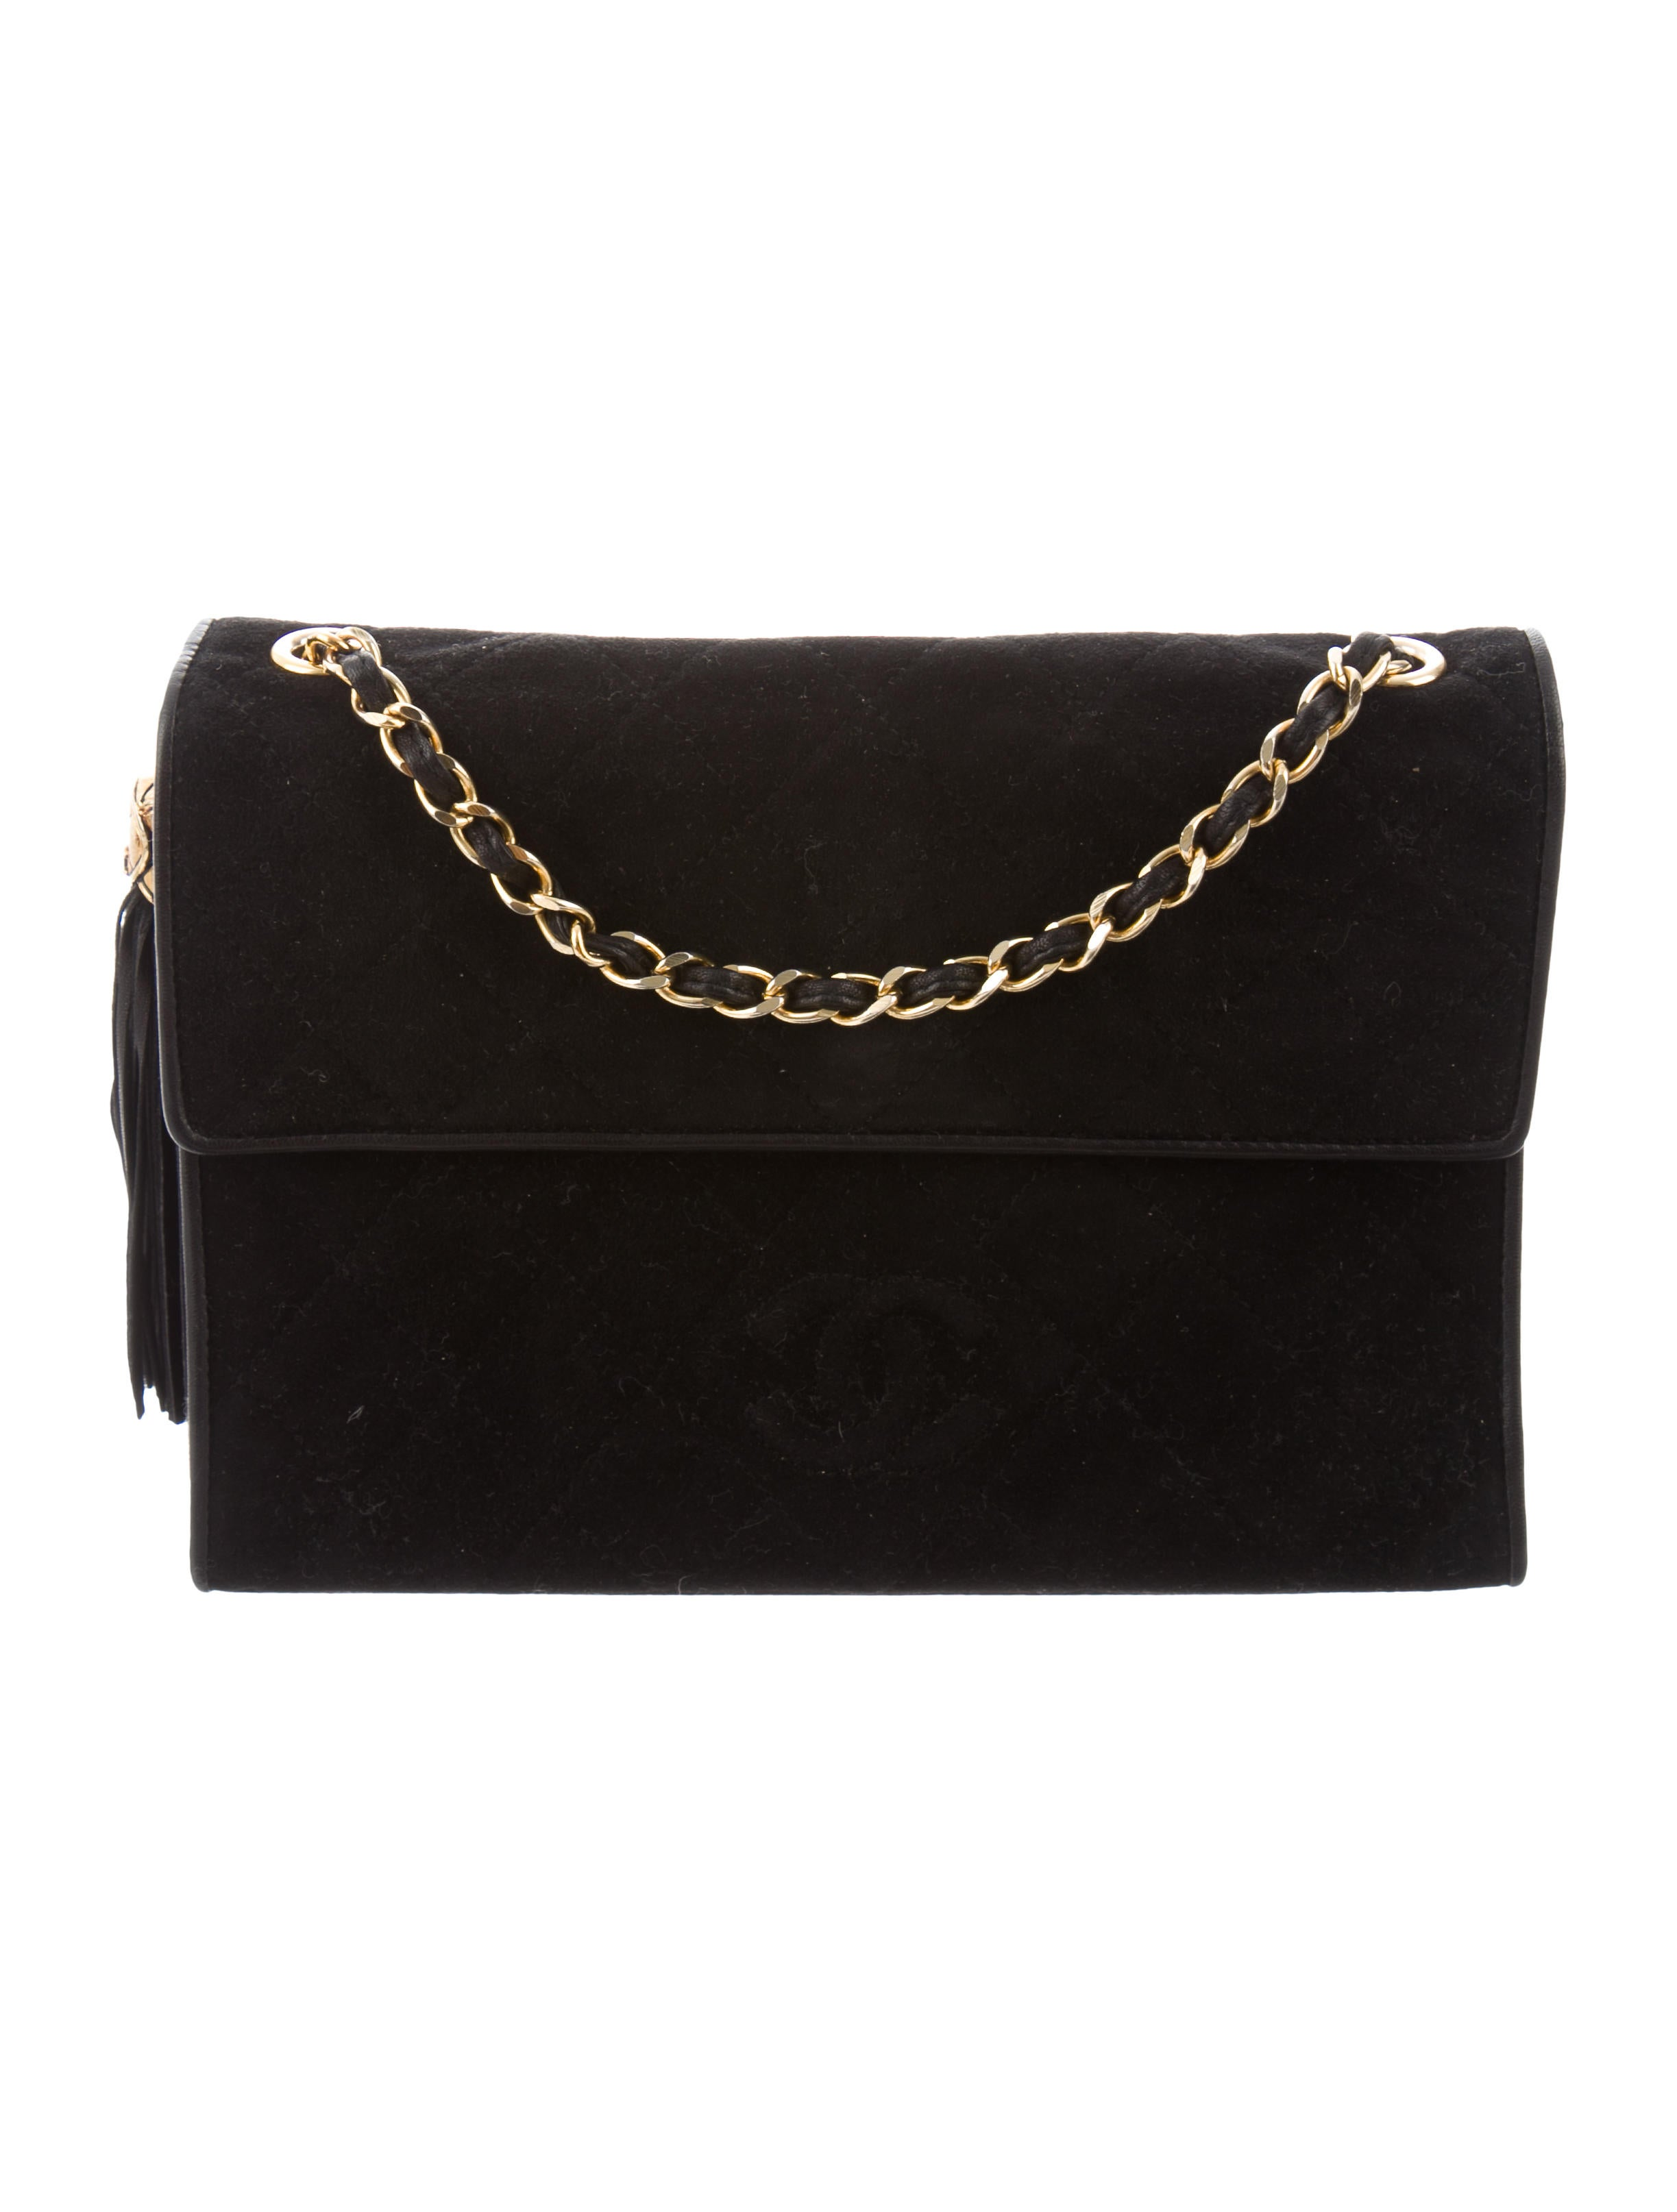 6365c9584bd9e Chanel Handbags